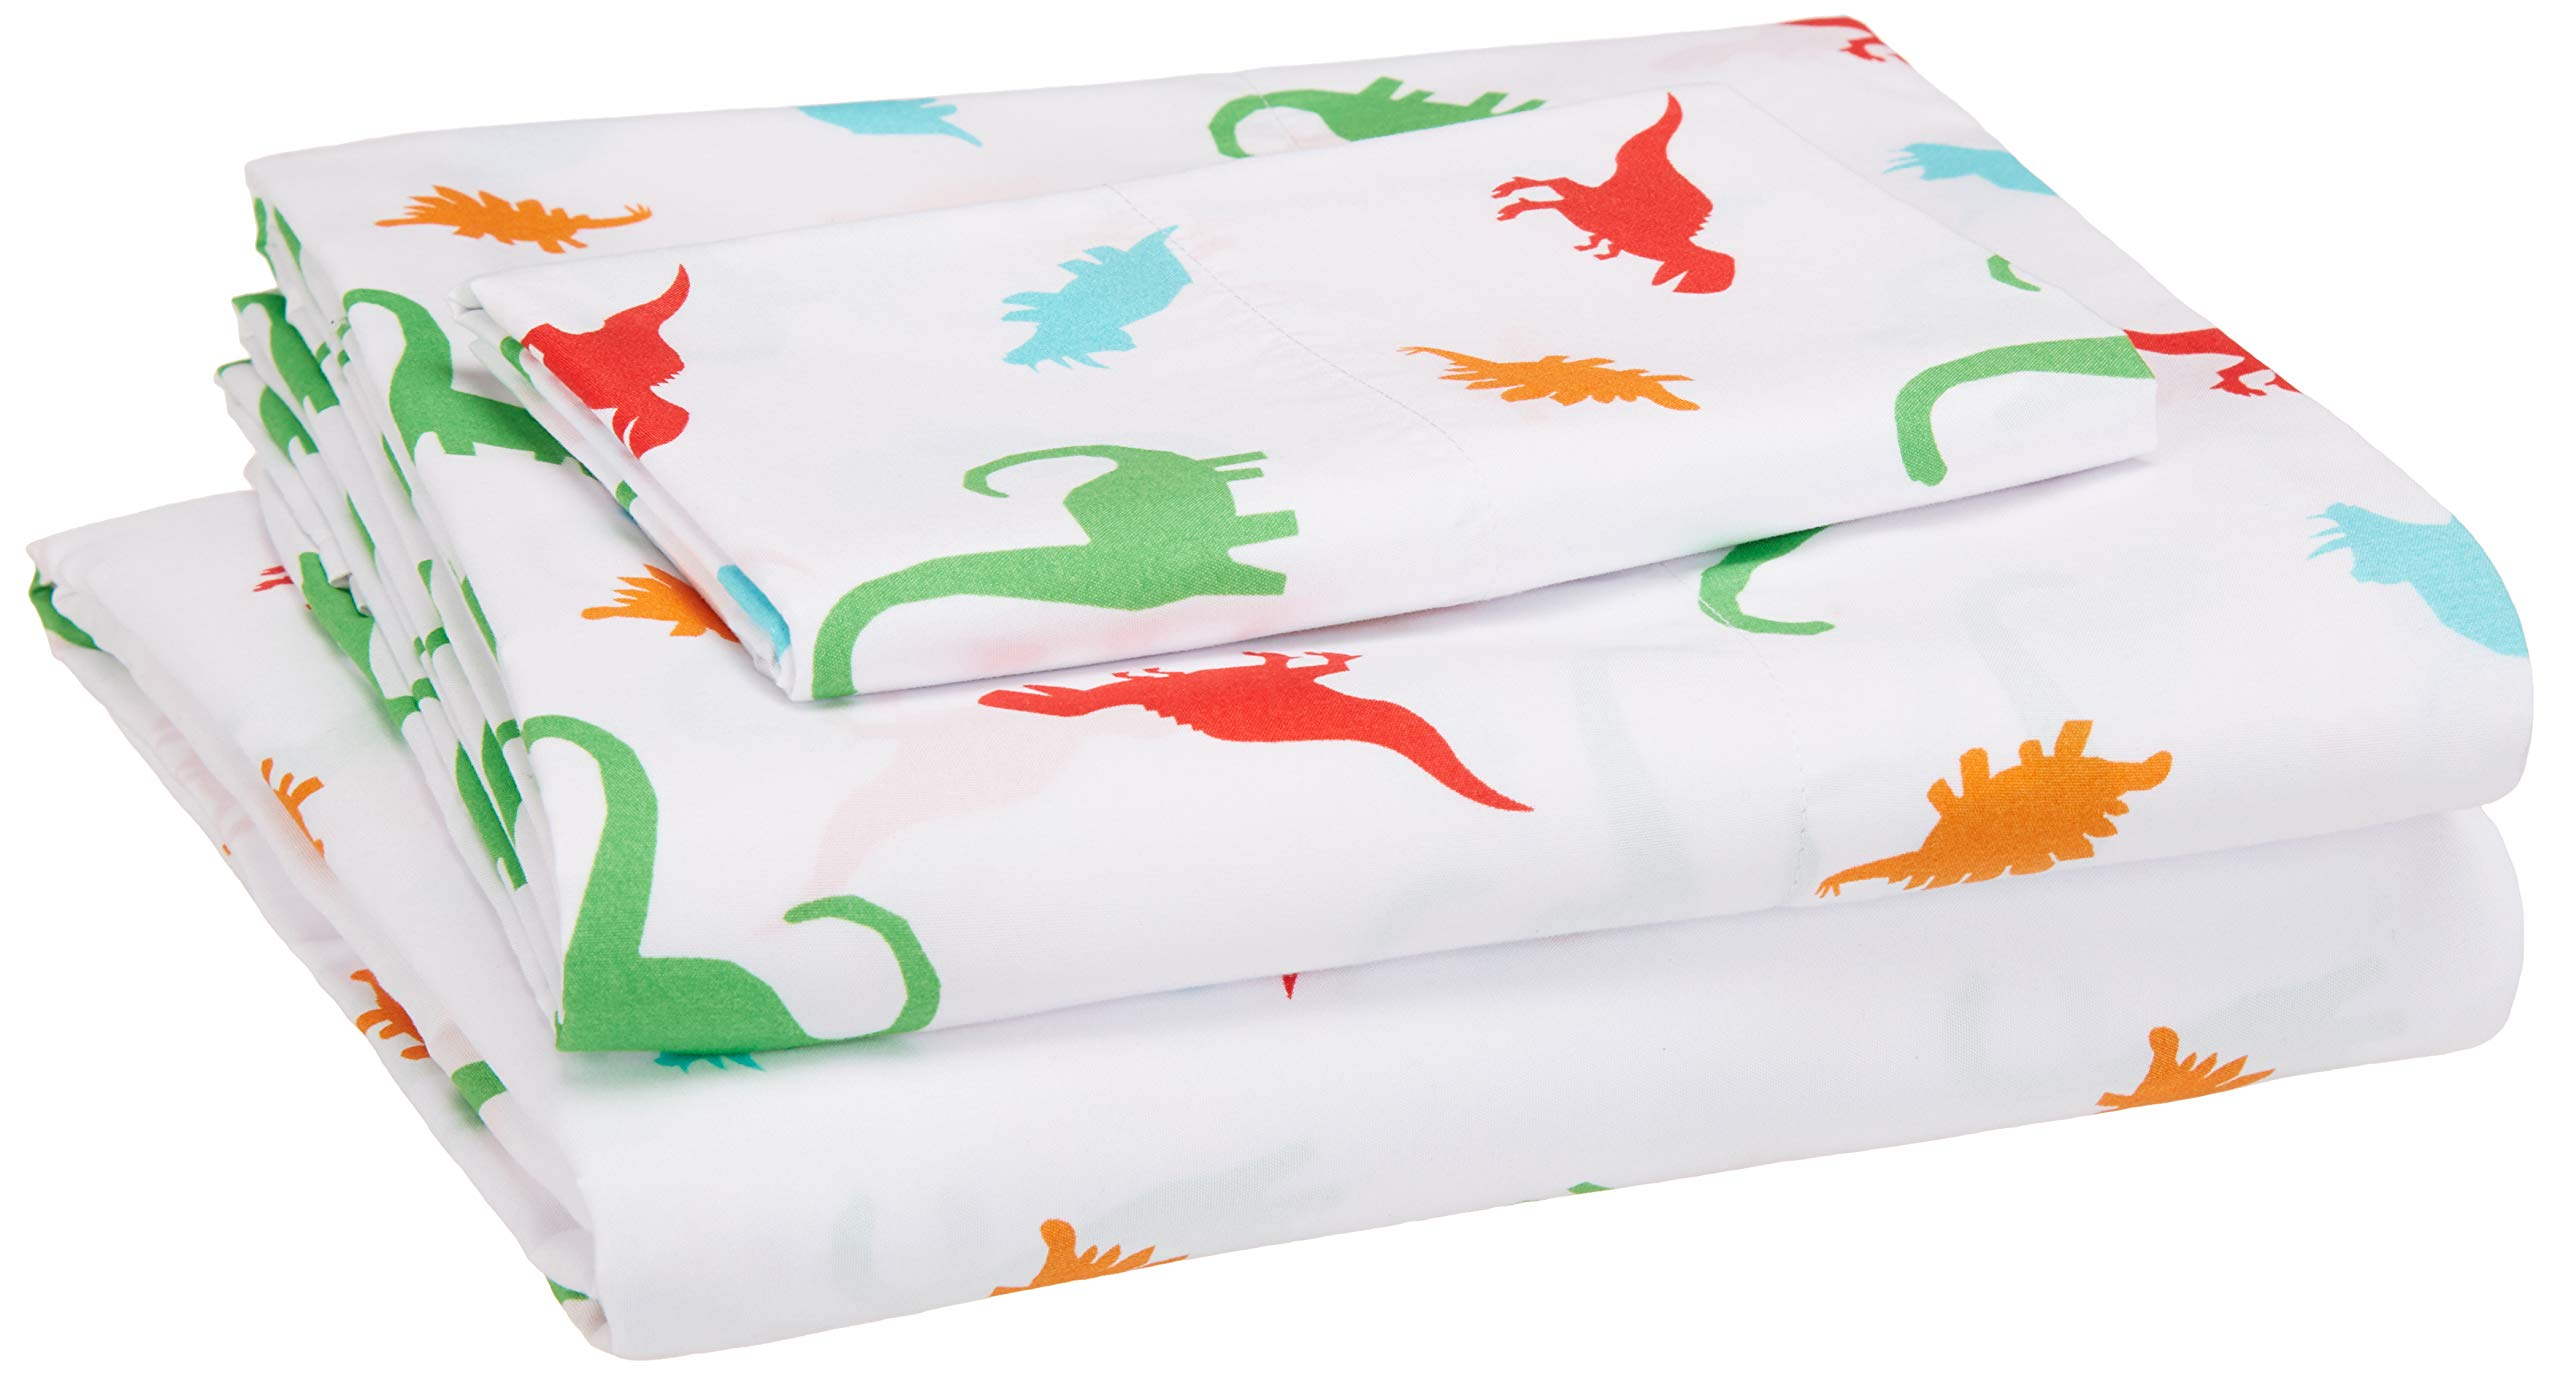 AmazonBasics Kid's Sheet Set - Soft, Easy-Wash Microfiber - Twin, Multi-Color Dinosaurs by AmazonBasics